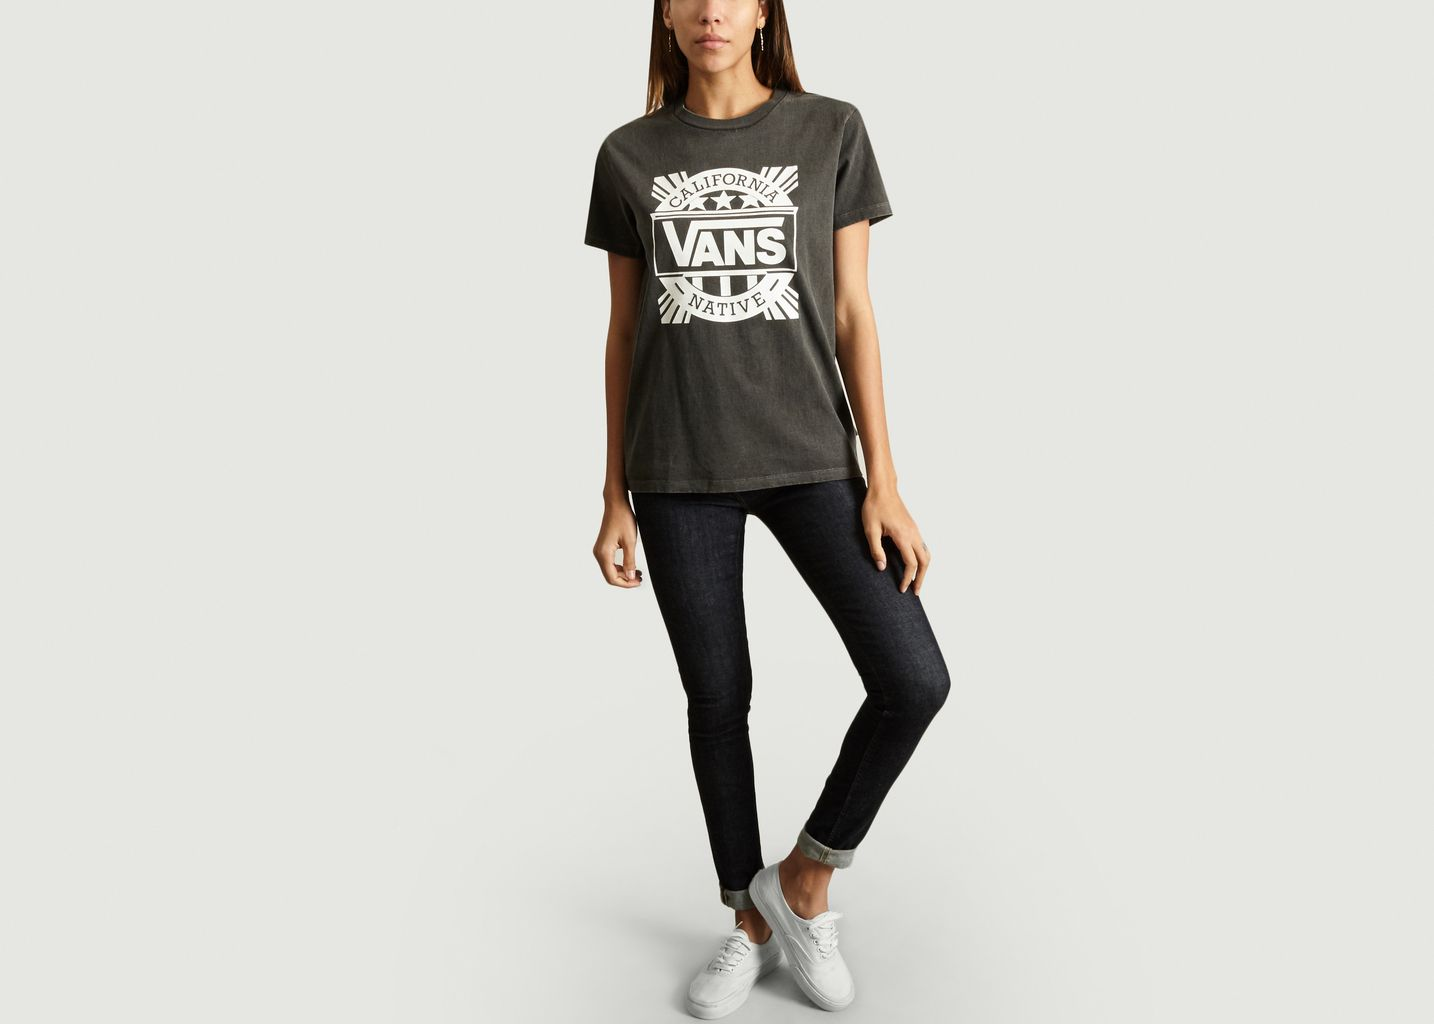 T-Shirt California Native - Vans